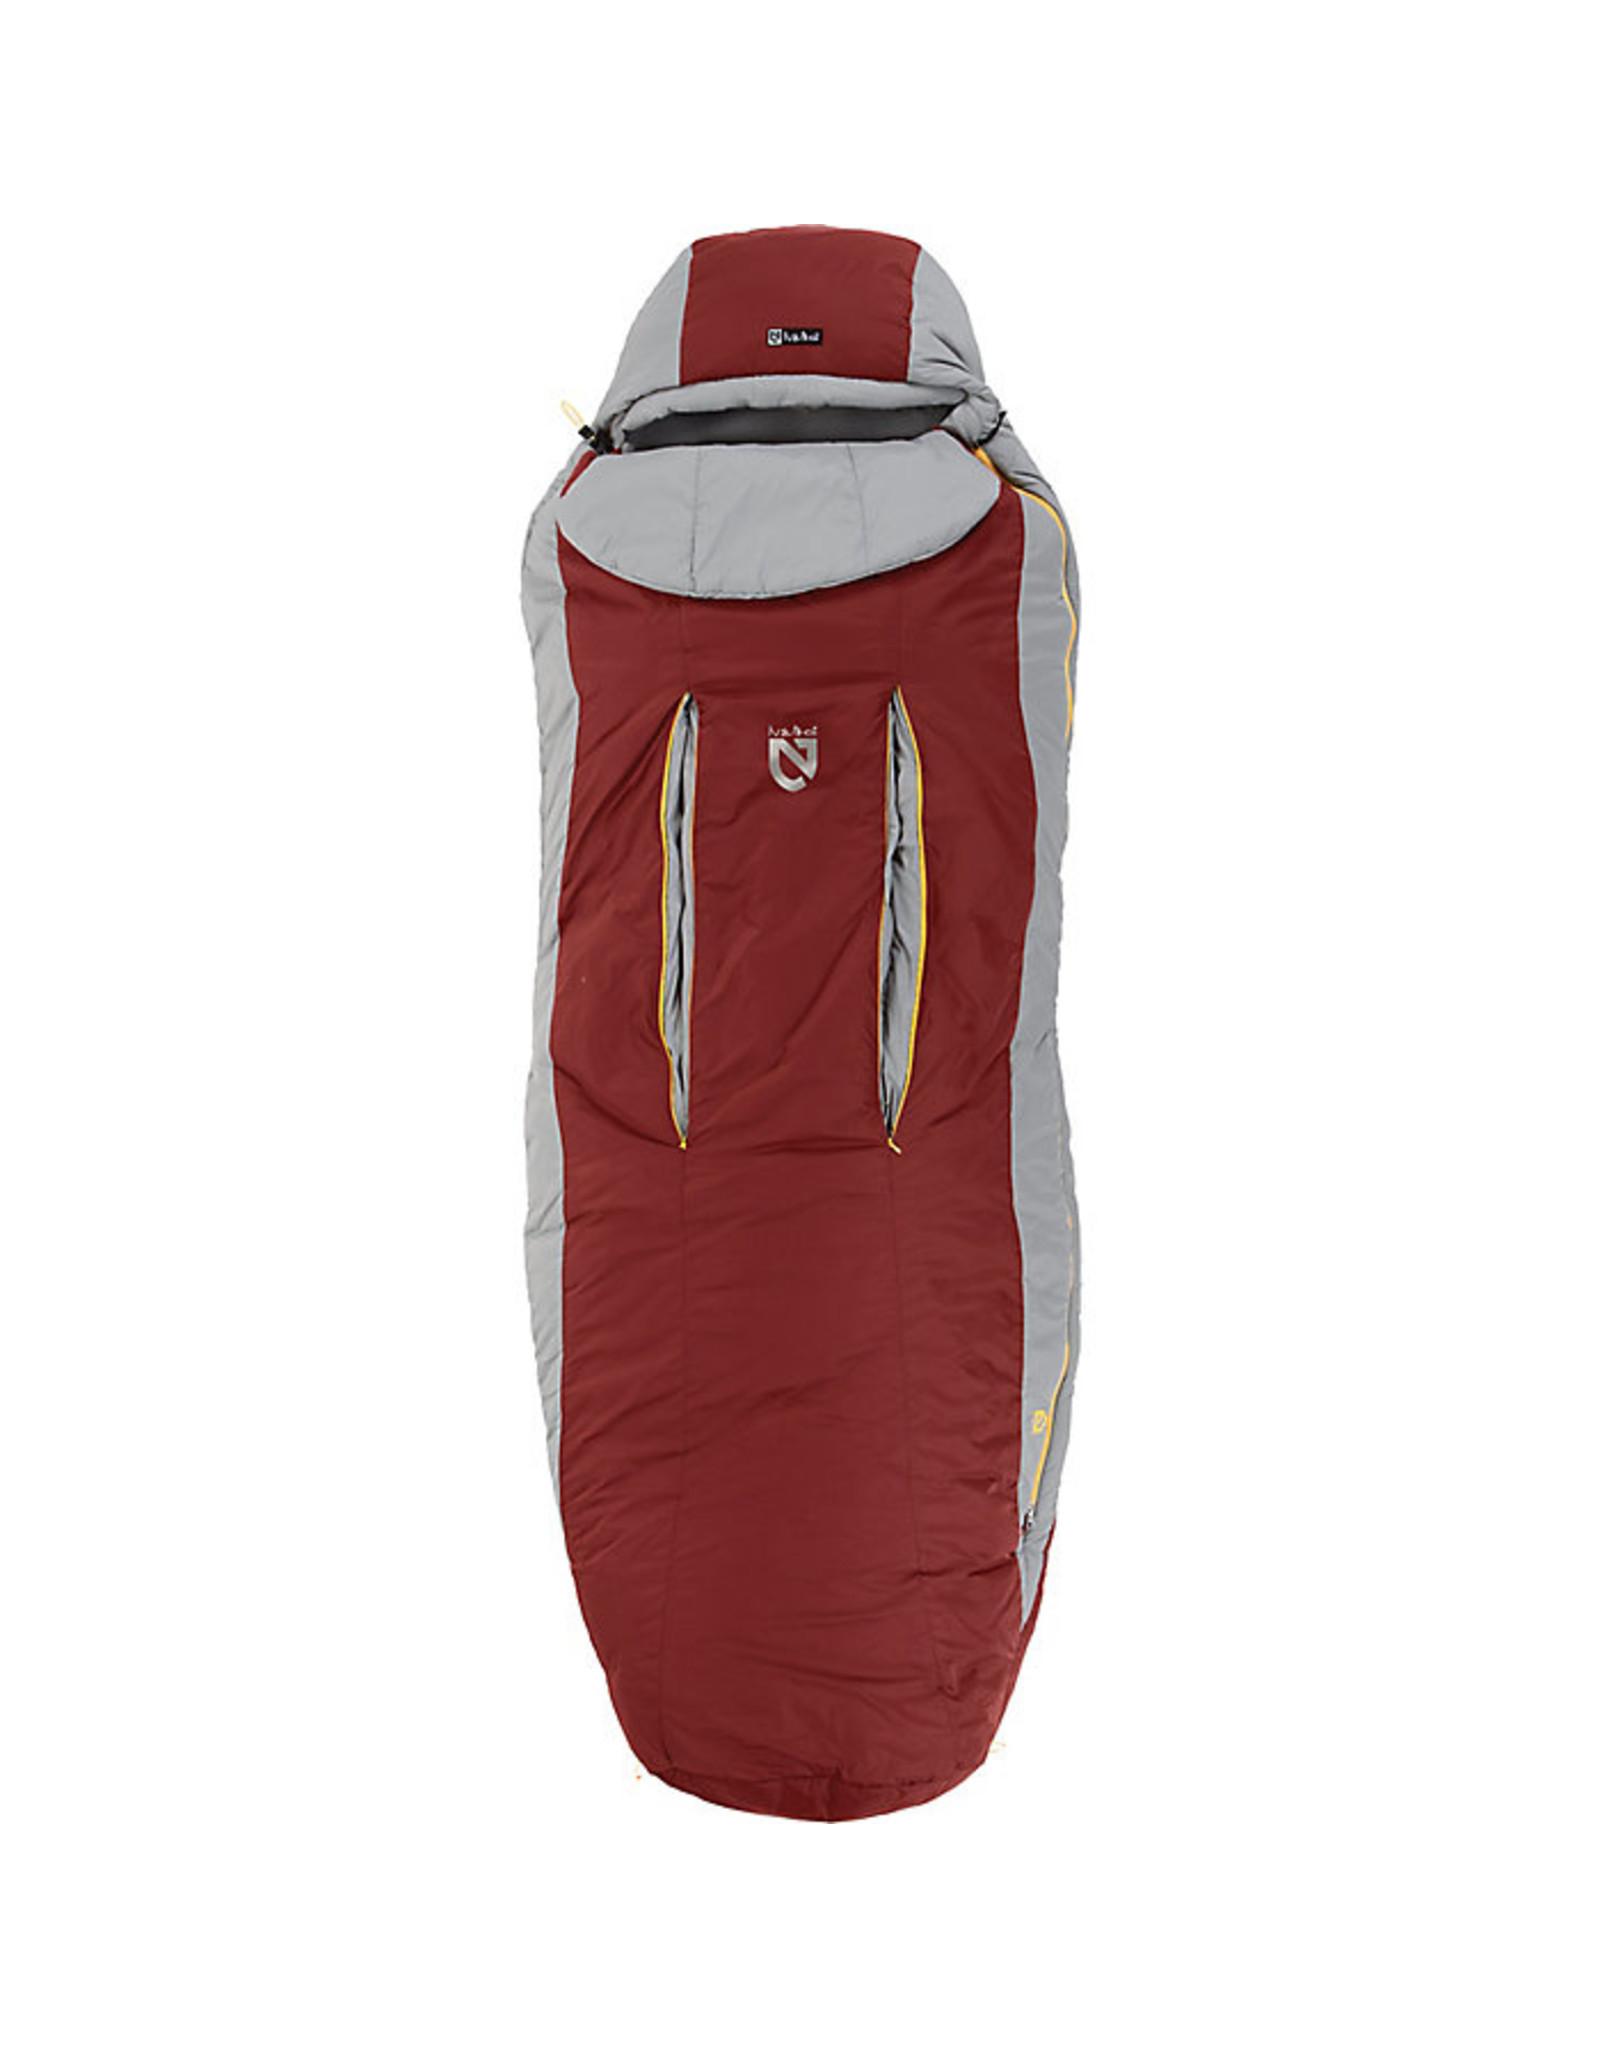 NEMO Forte Sleeping Bag - Regular  35F